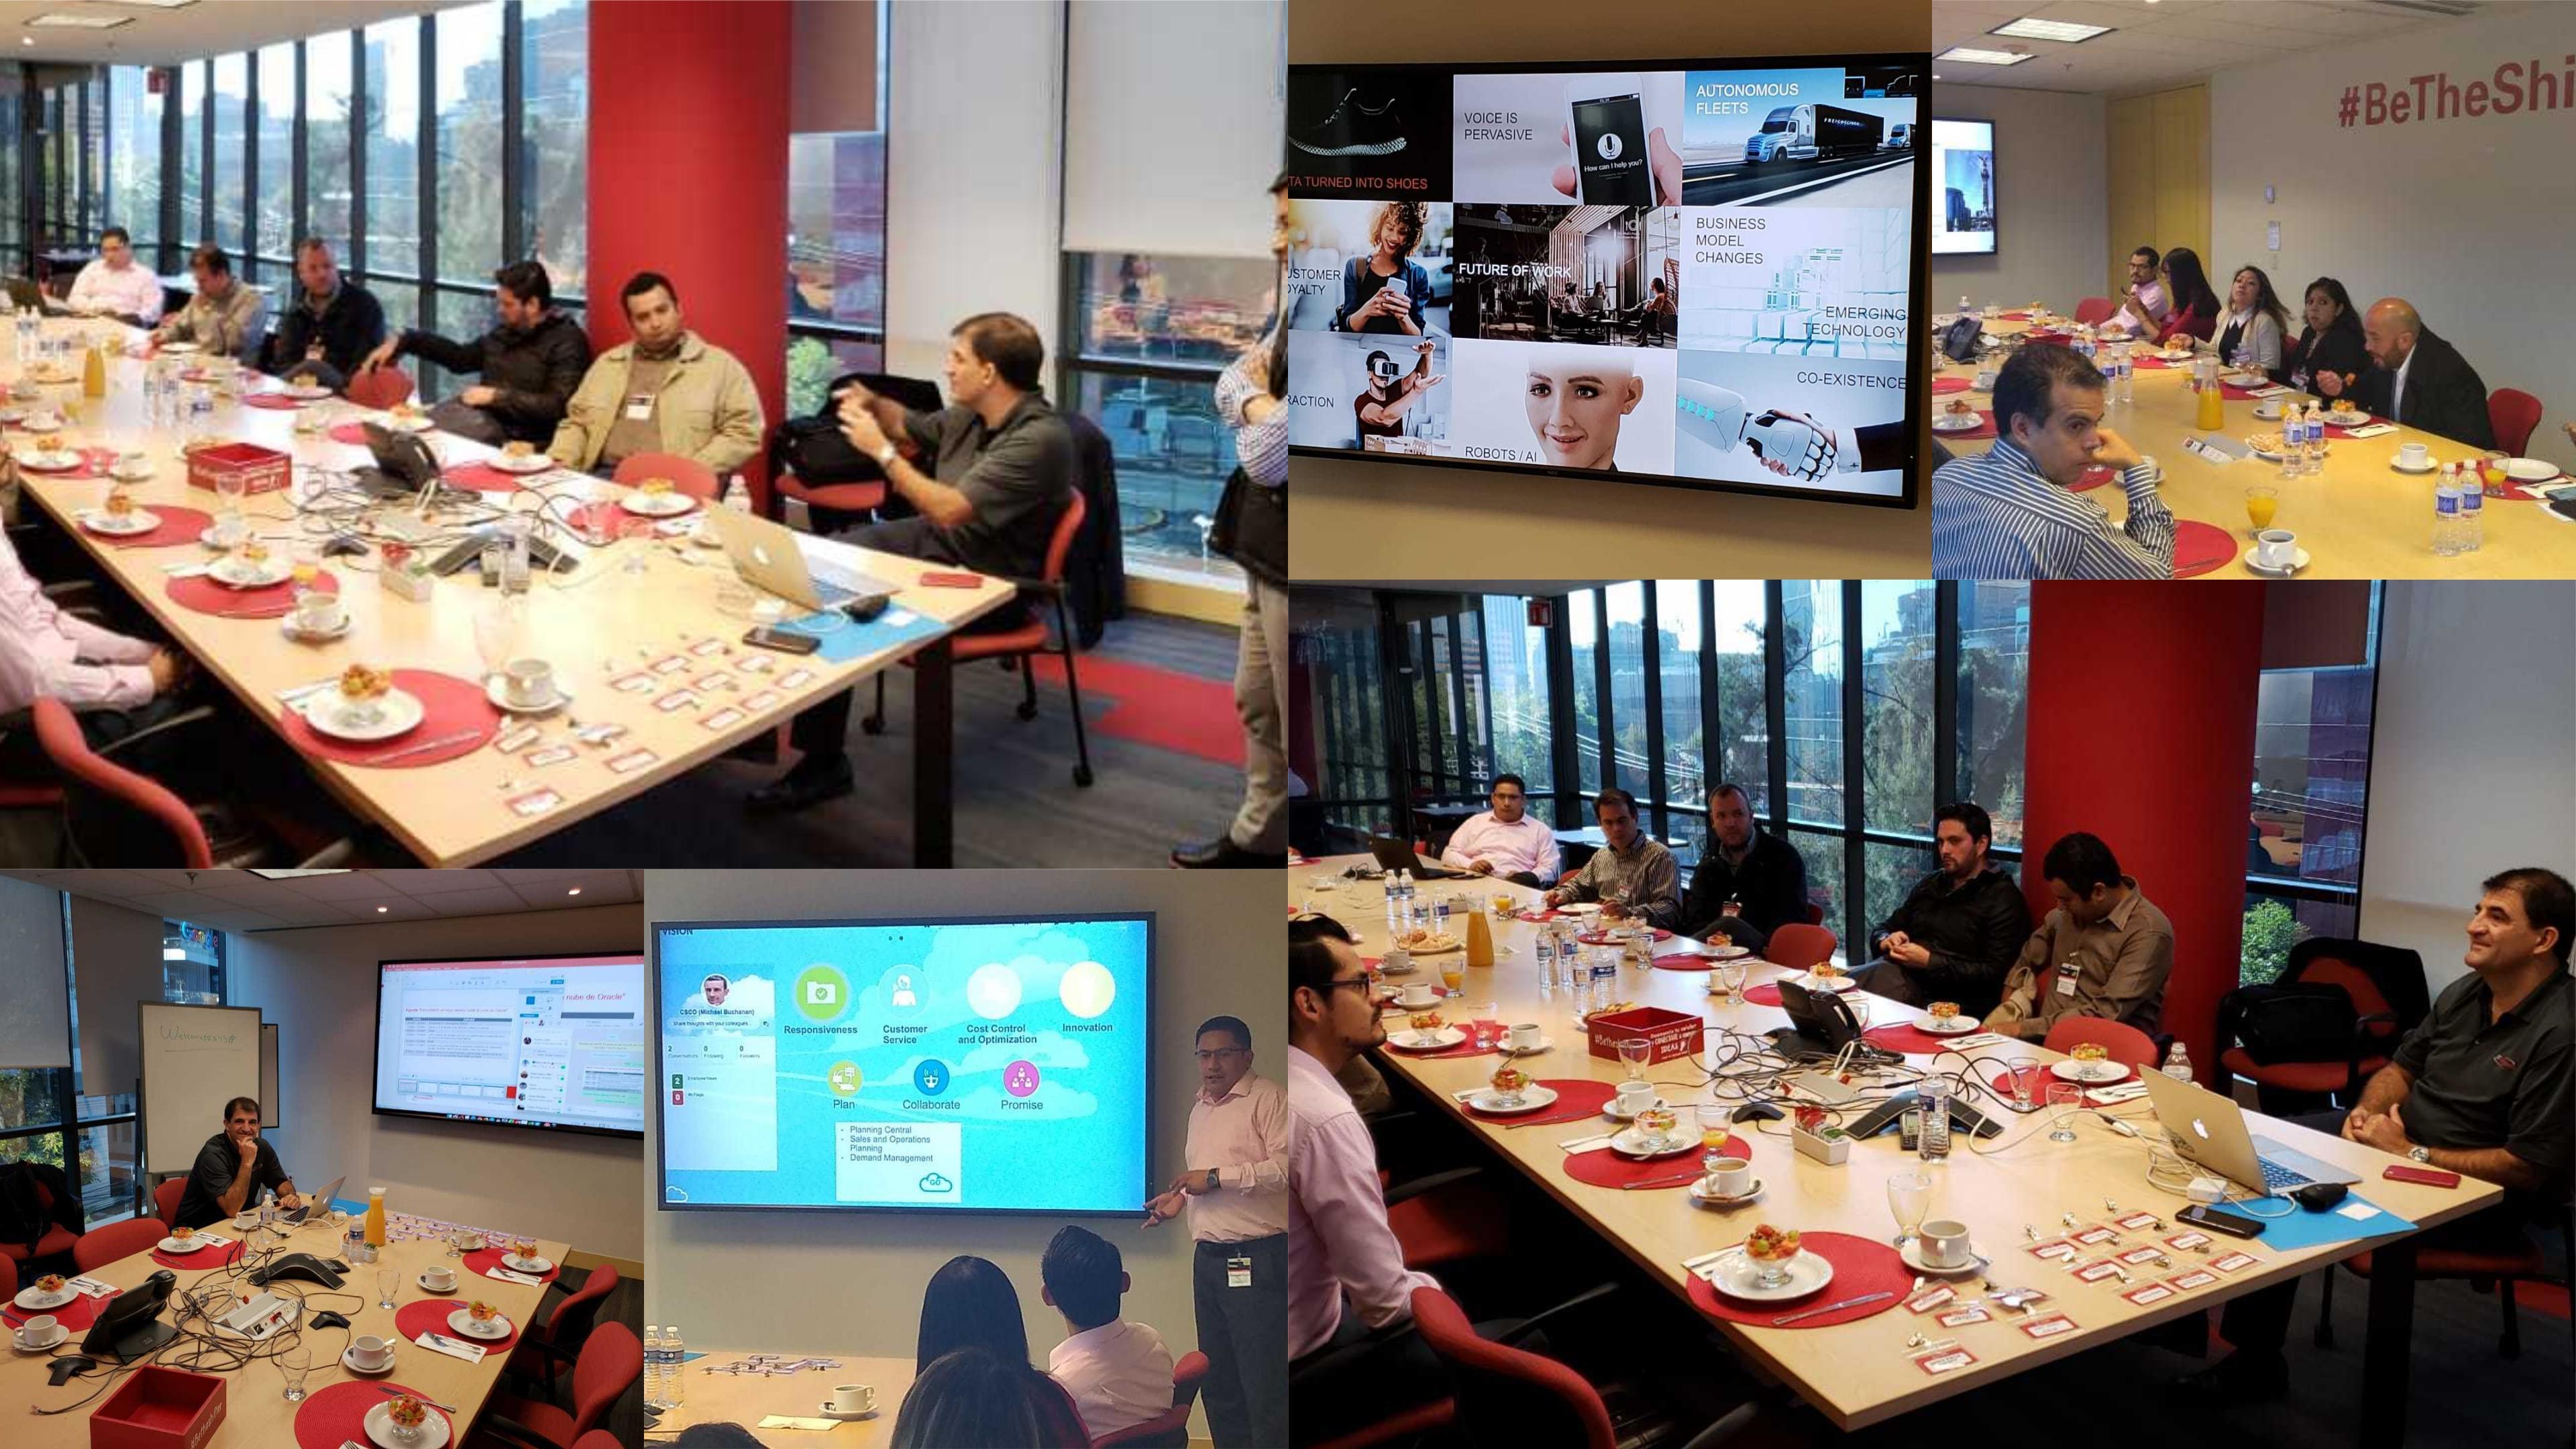 ITC Workshop on Oracle Cloud Technologies